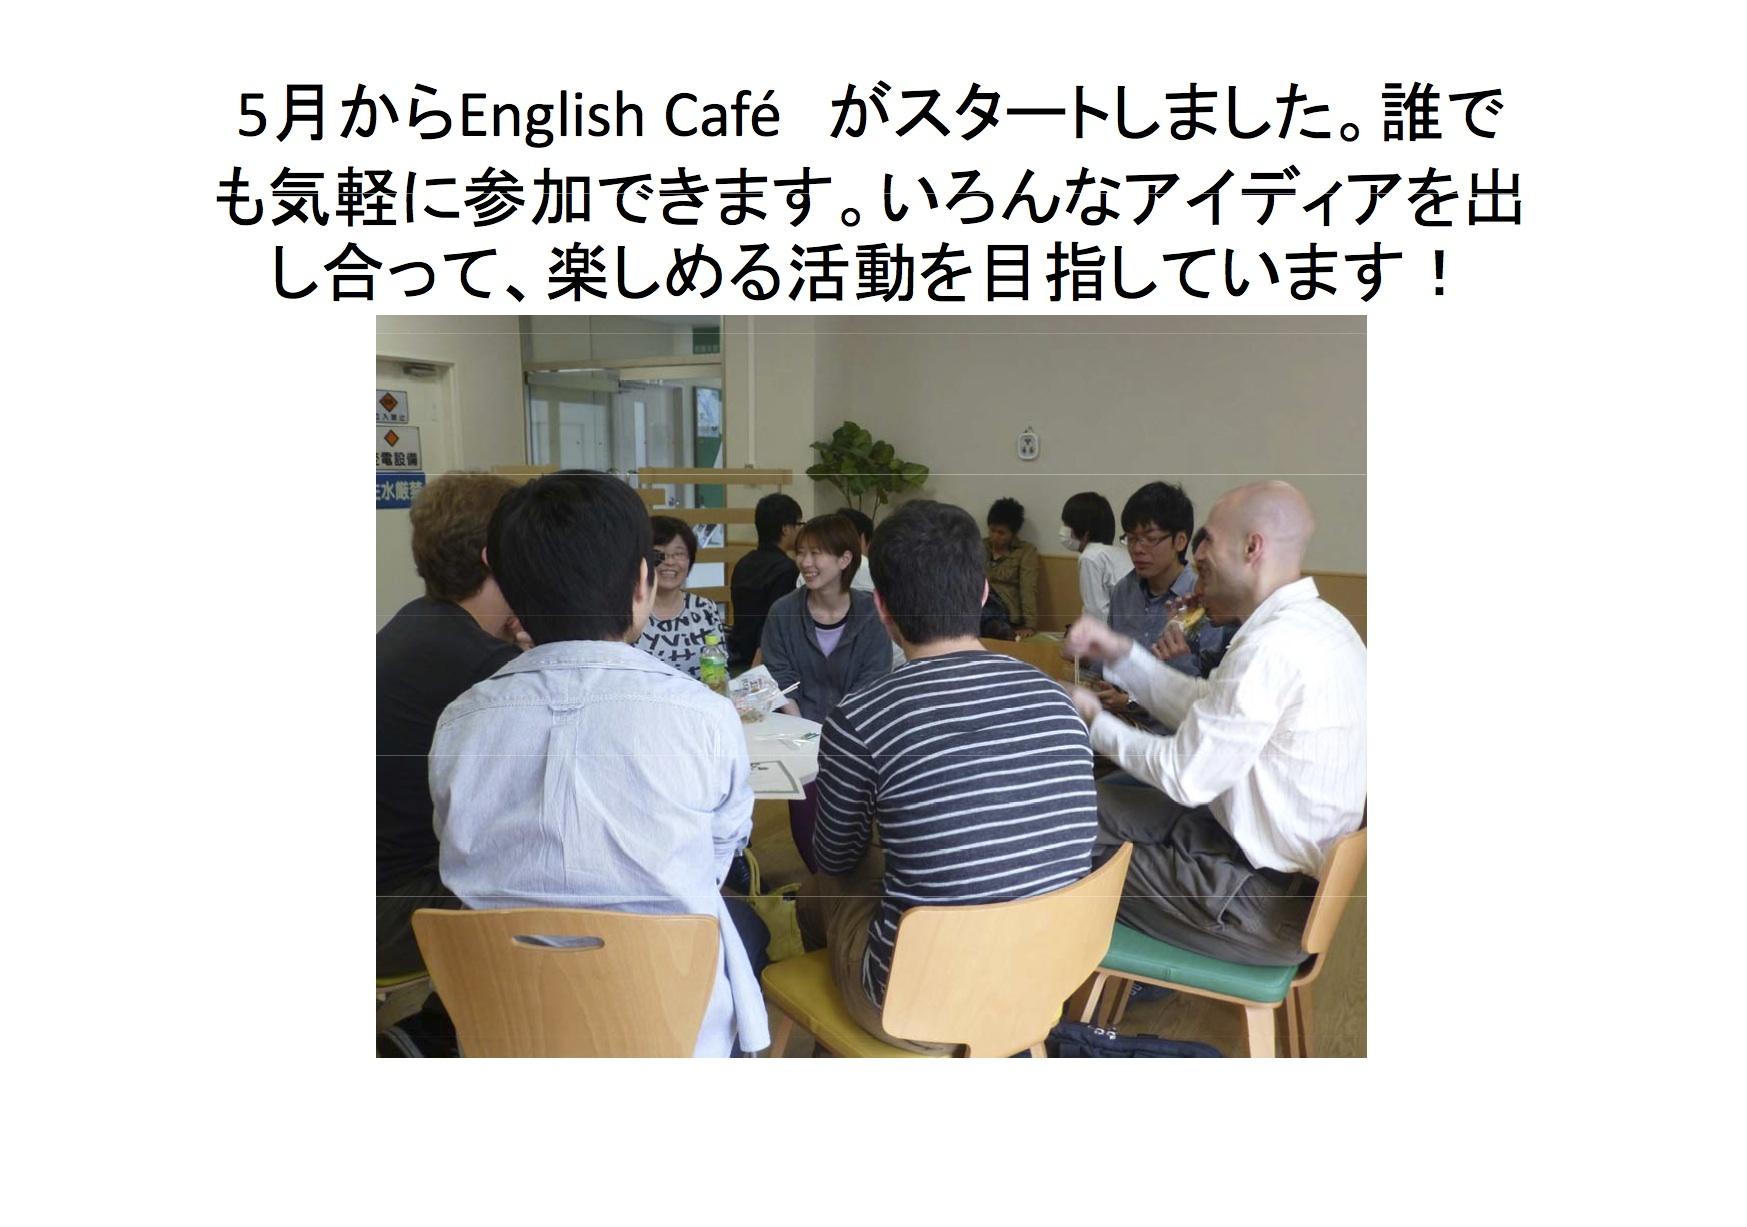 english cafe foto.jpg